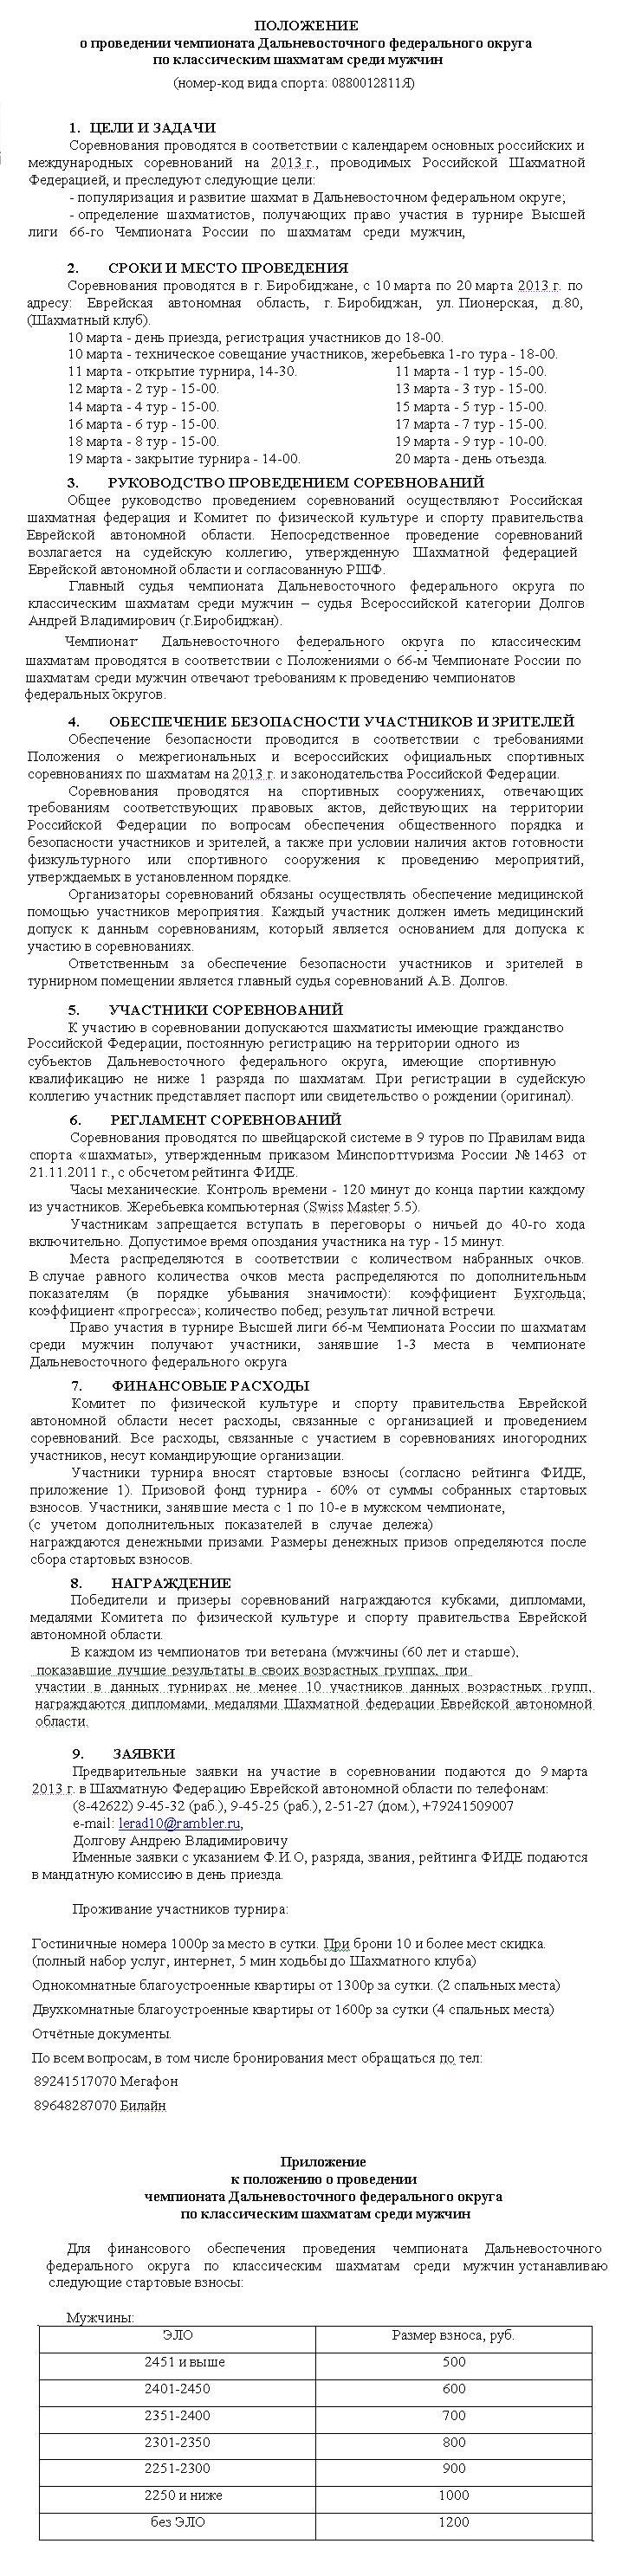 http://s2.uploads.ru/8oYt2.jpg